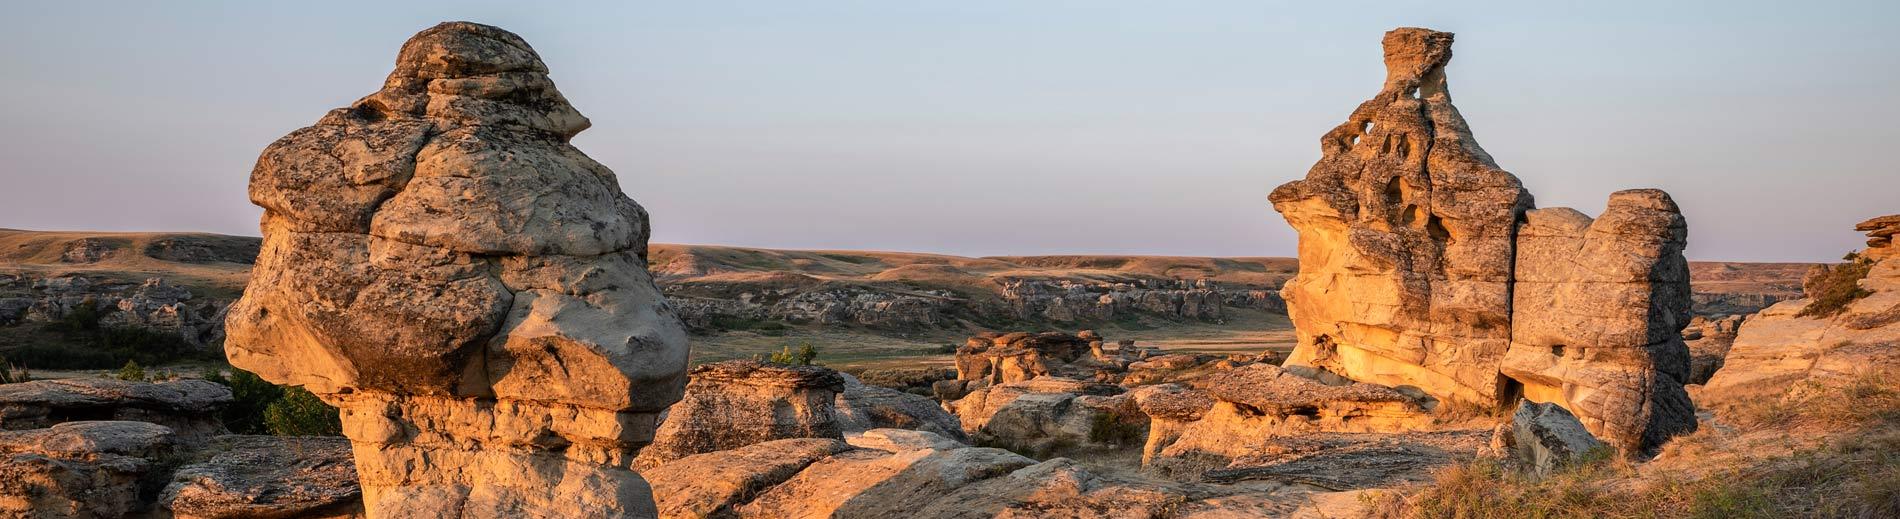 writing on stone provincial park Alberta Canada